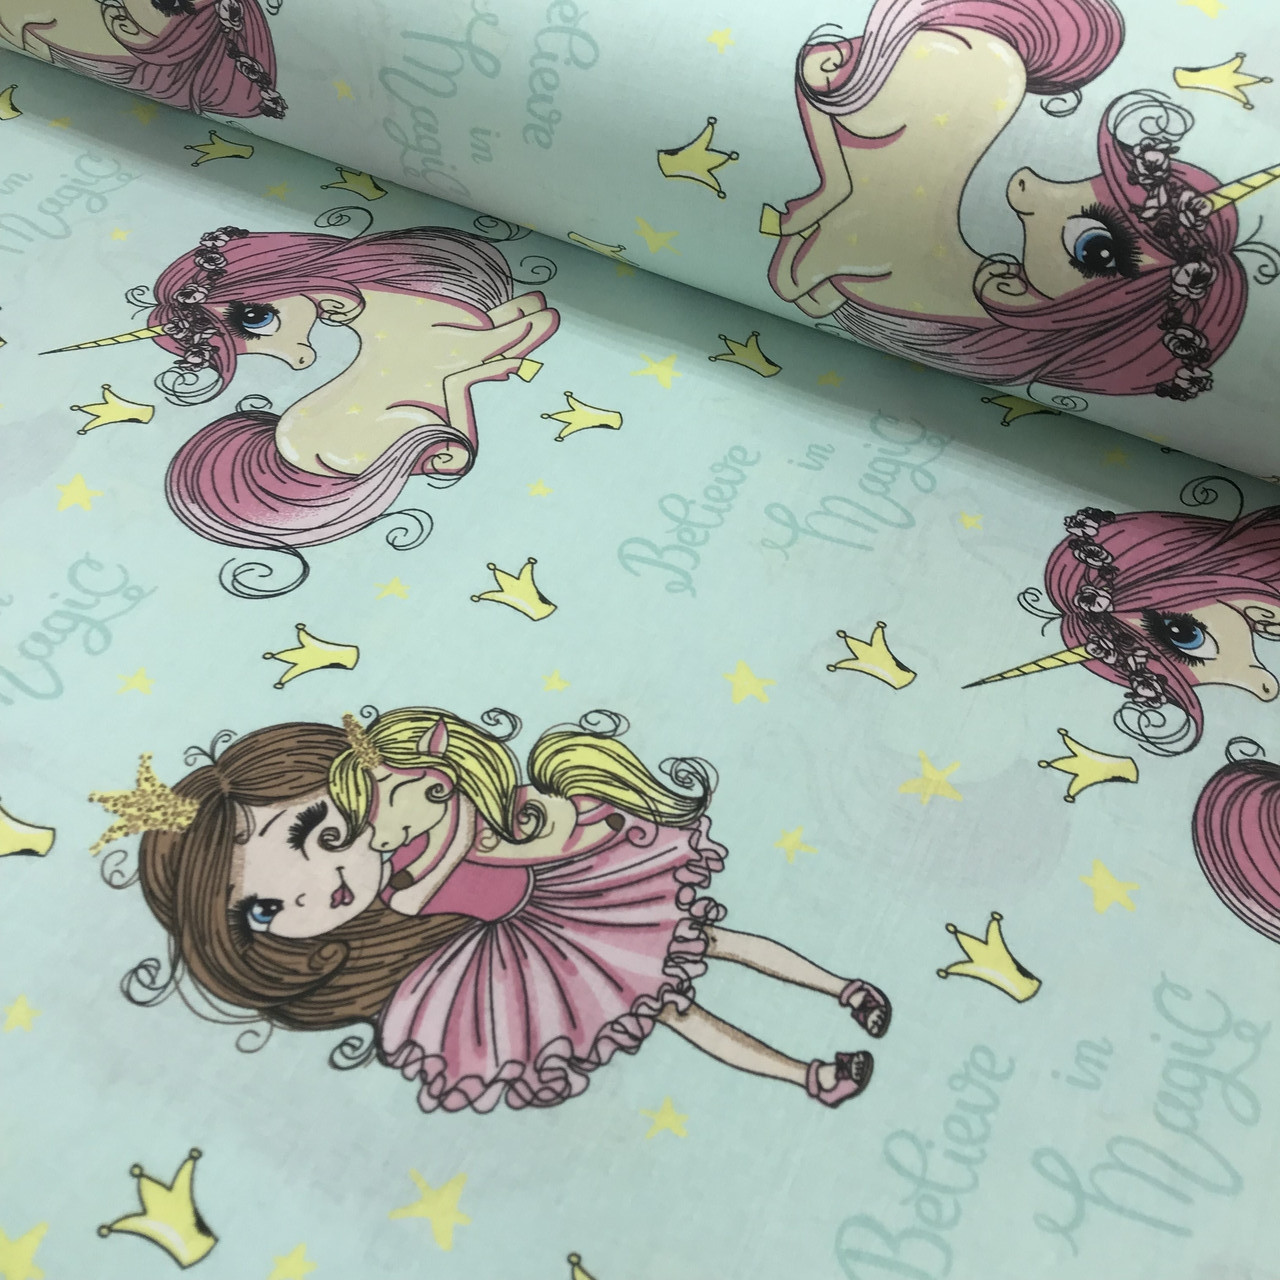 Хлопковая ткань (ТУРЦИЯ шир. 2,4 м) принцесса с единорогом ...